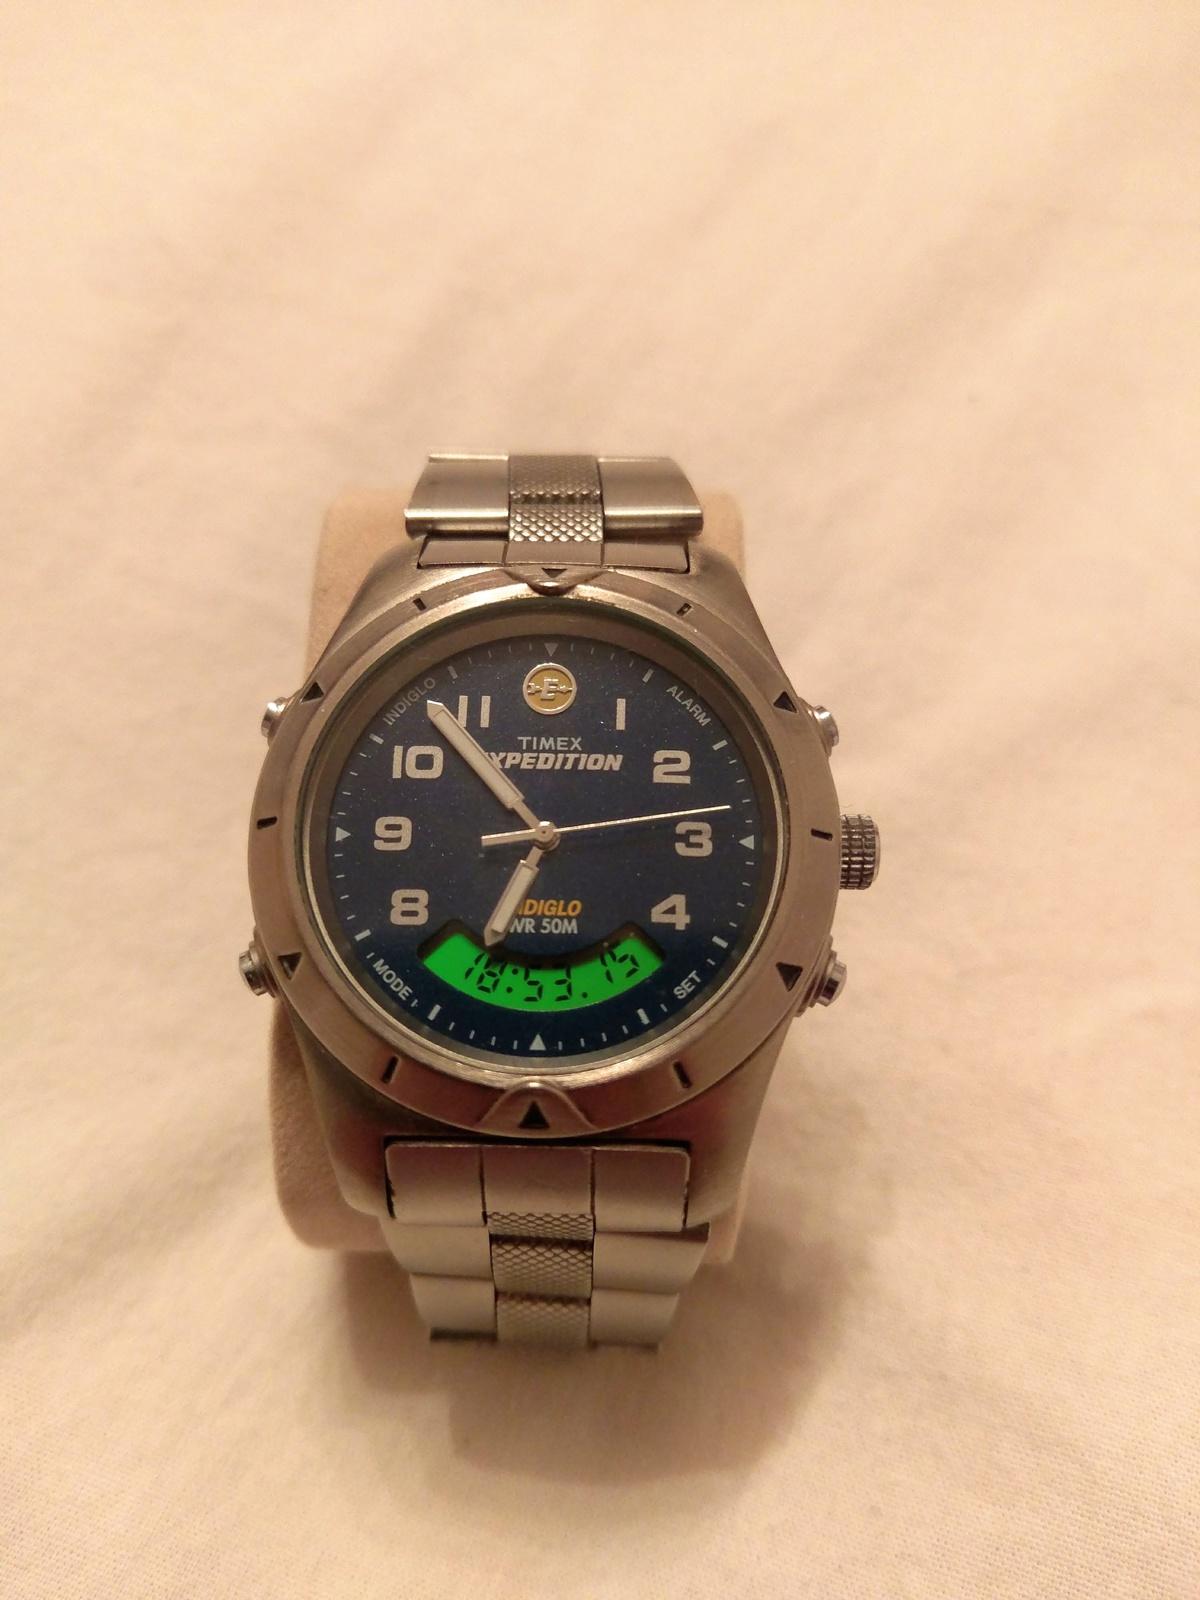 8eace9f82eb Verkauf Timex expedition t44653 UhrForum